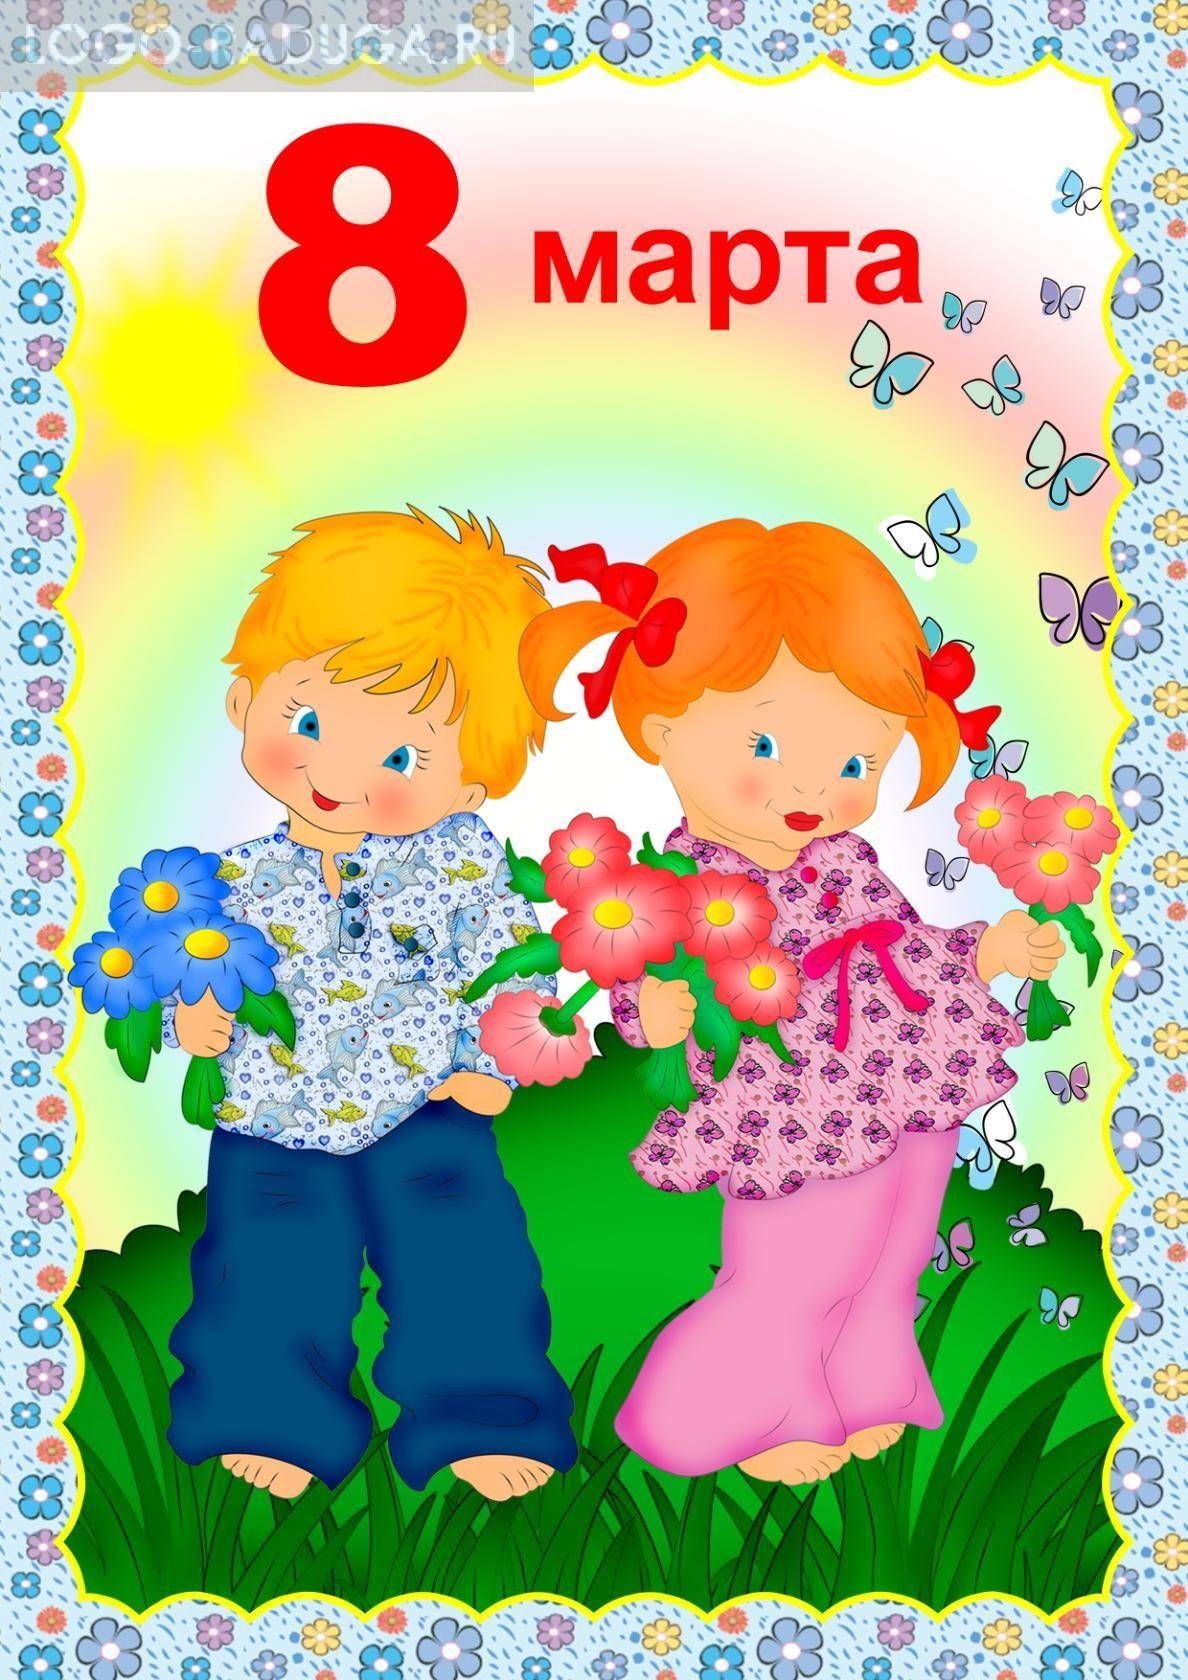 http://logo-raduga.ru/wp-content/uploads/01.jpg